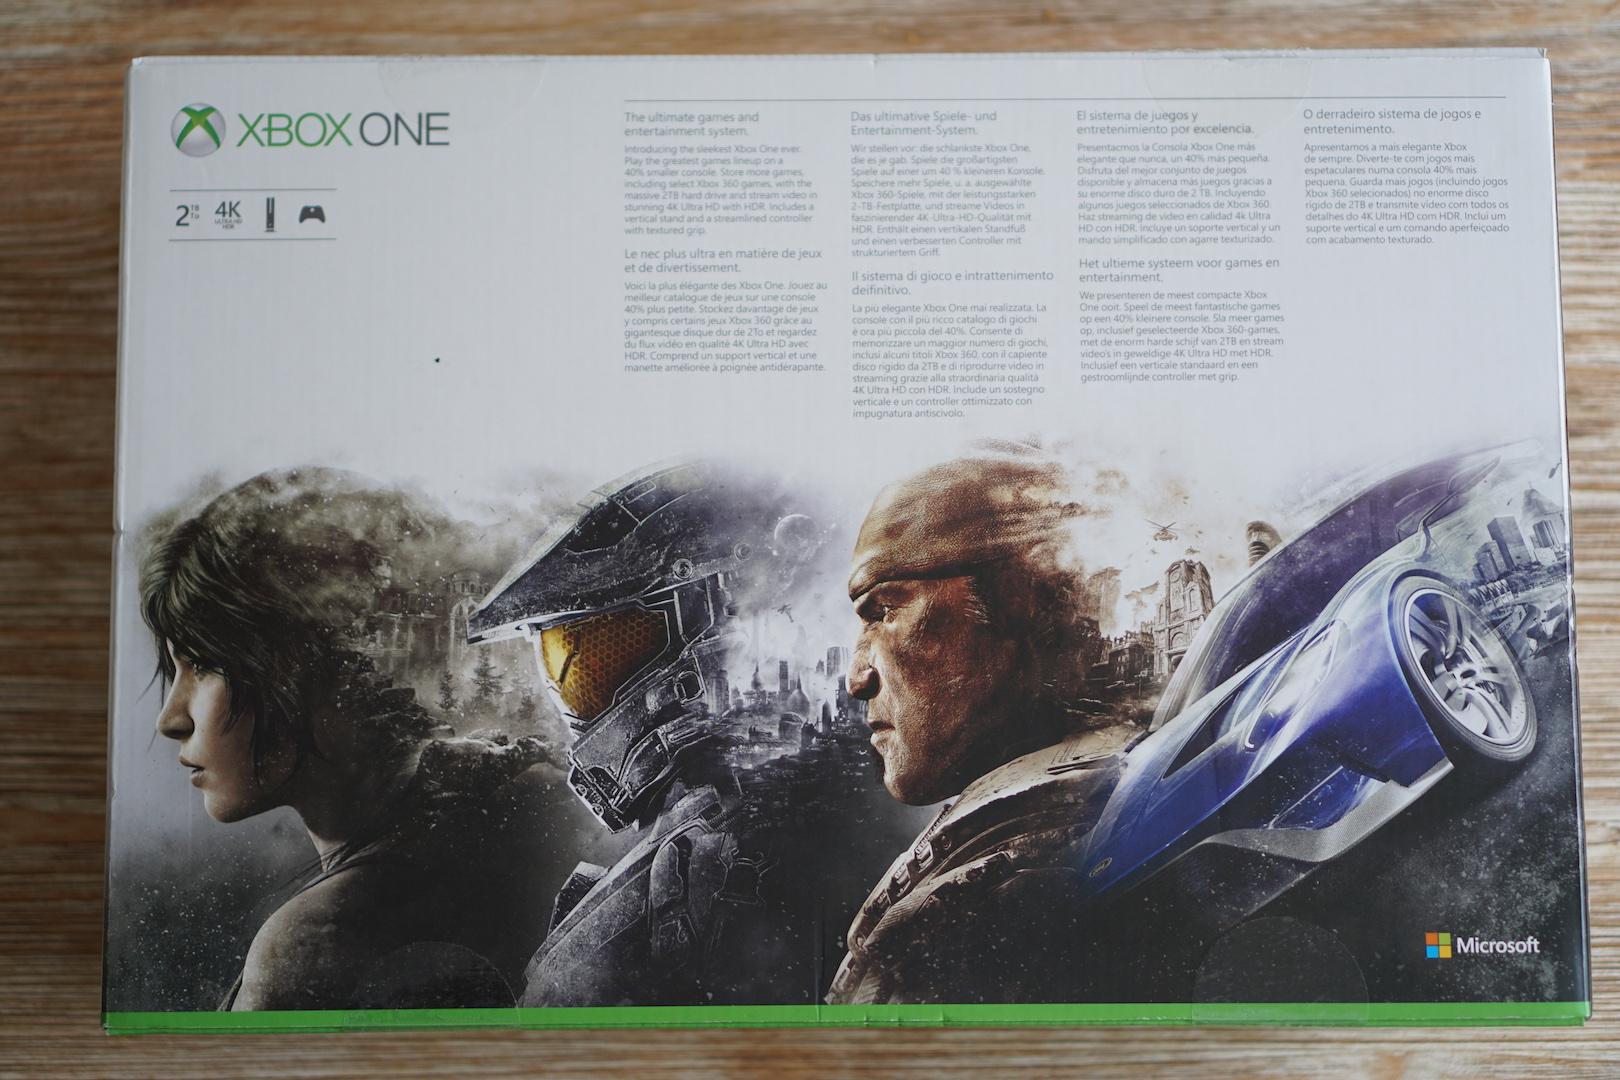 Unboxing Xbox One